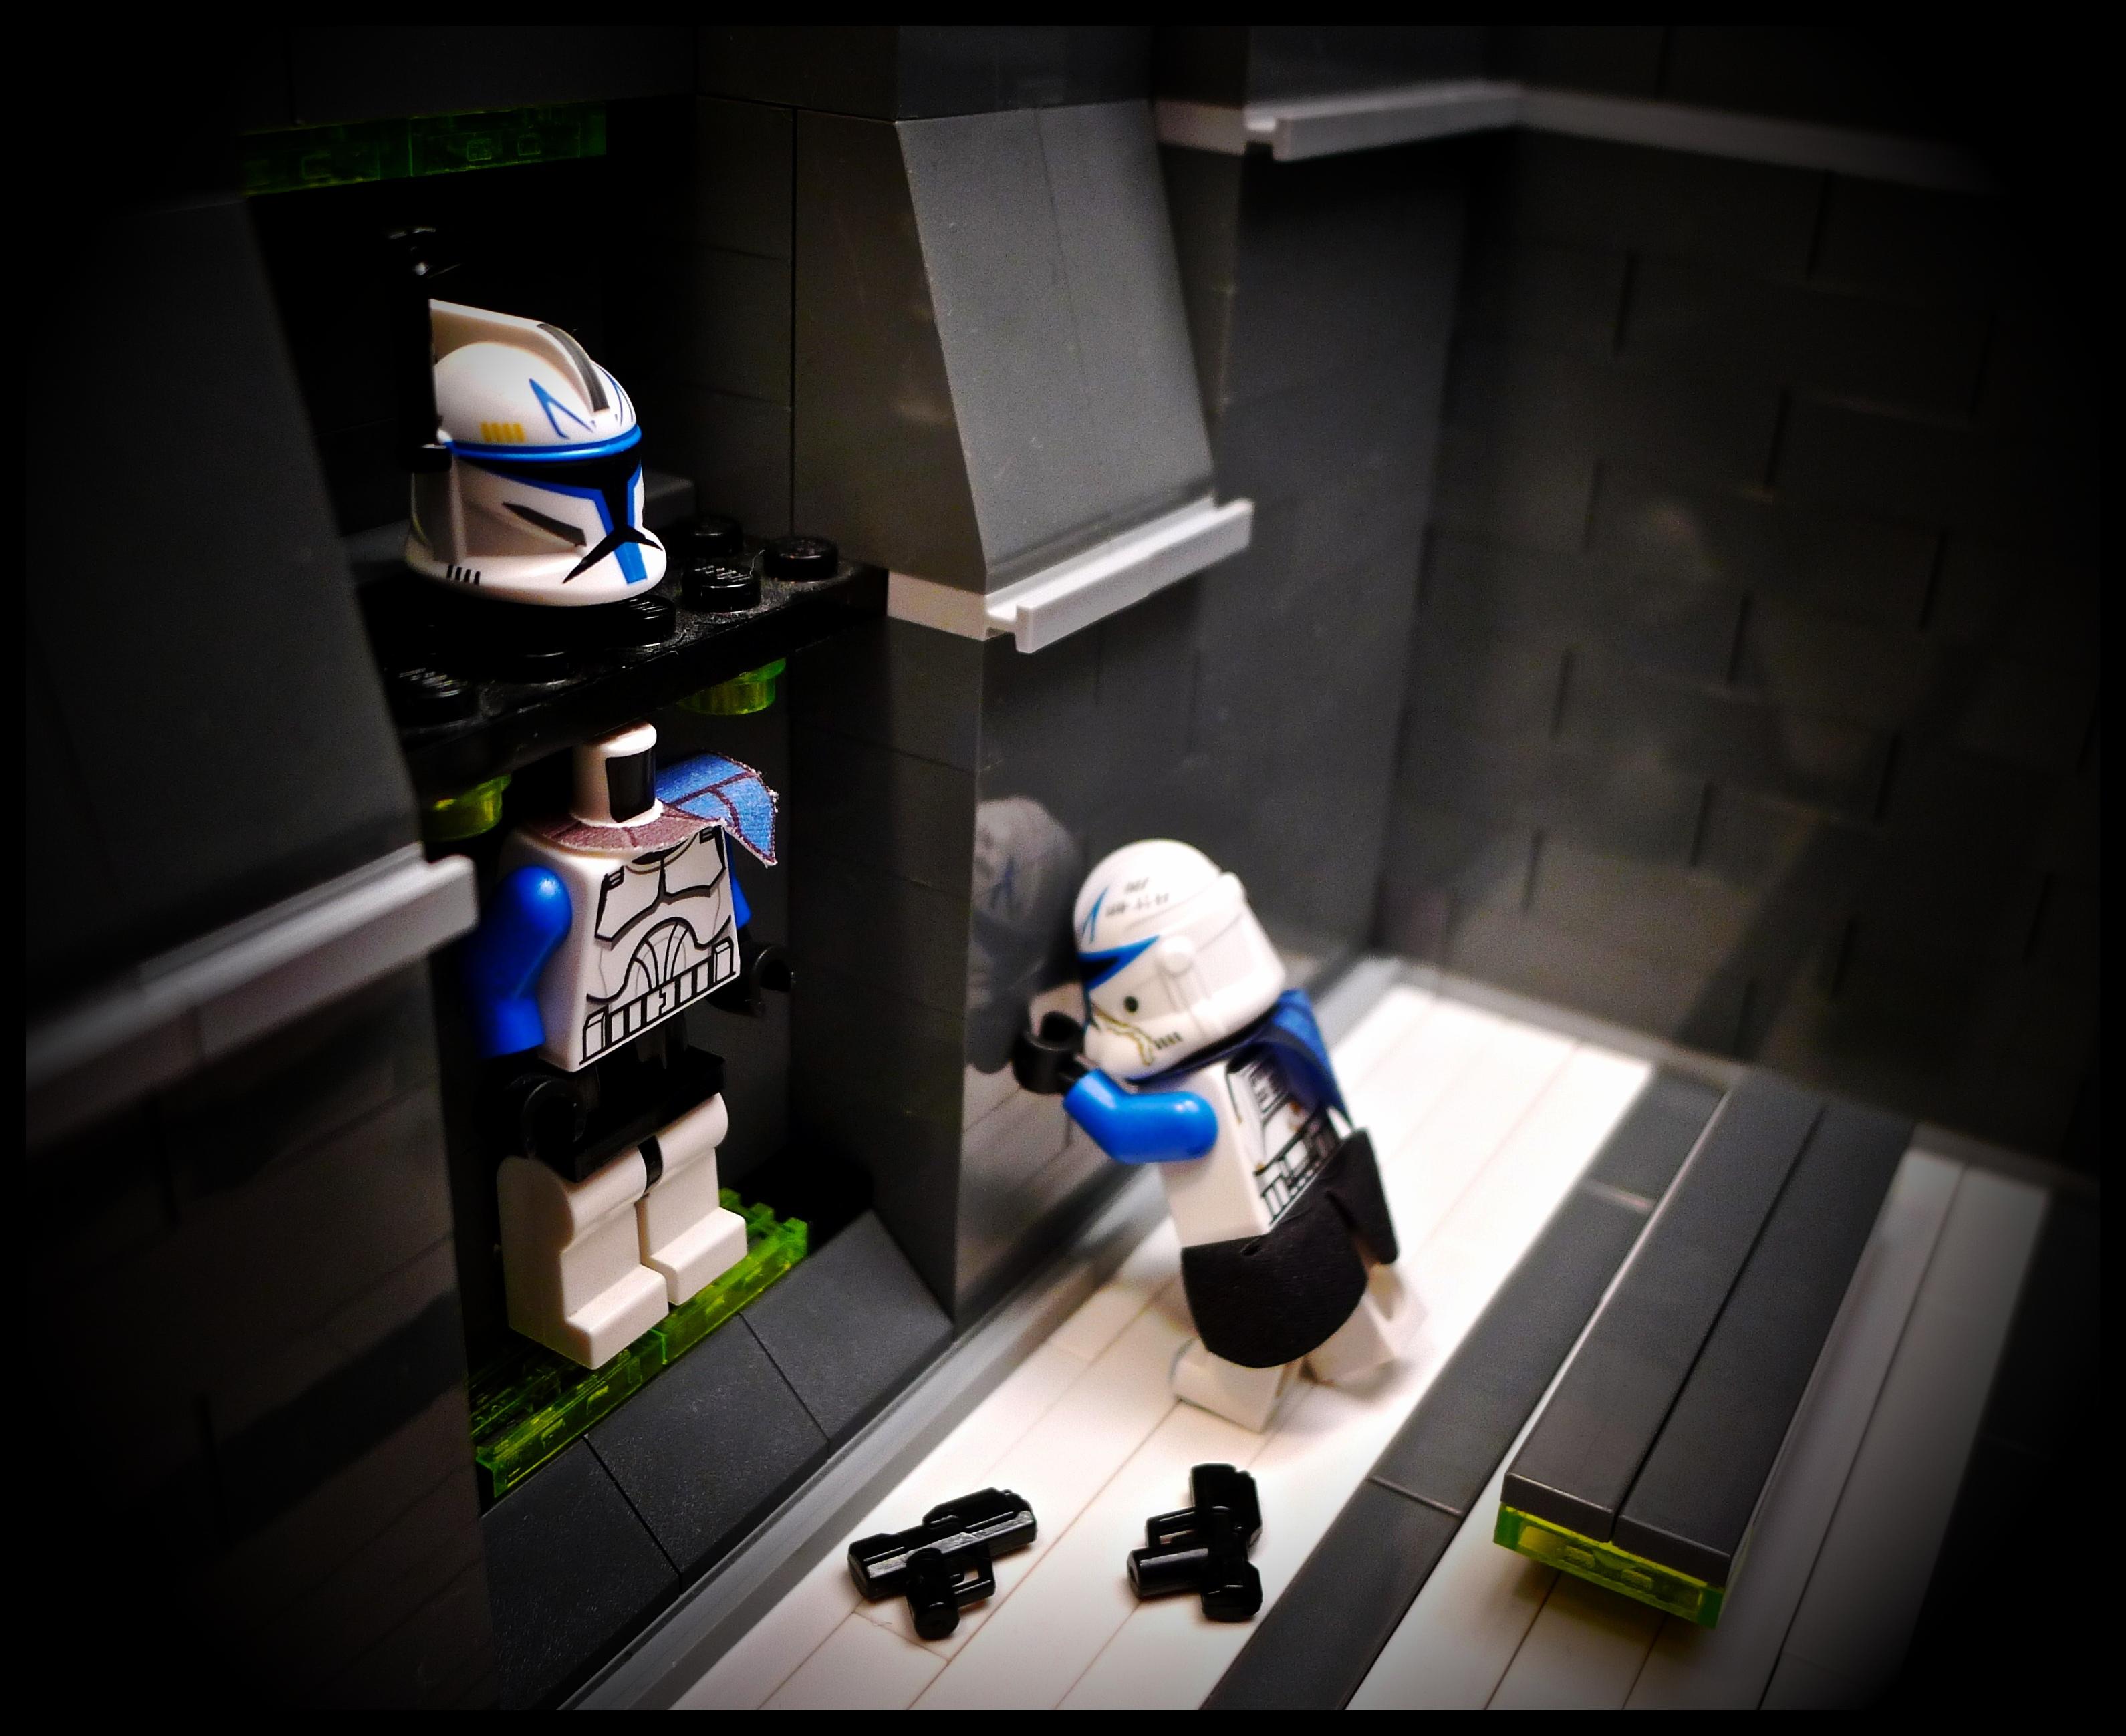 Wallpaper Space Lego Helmet Armor Technology Toy Captain